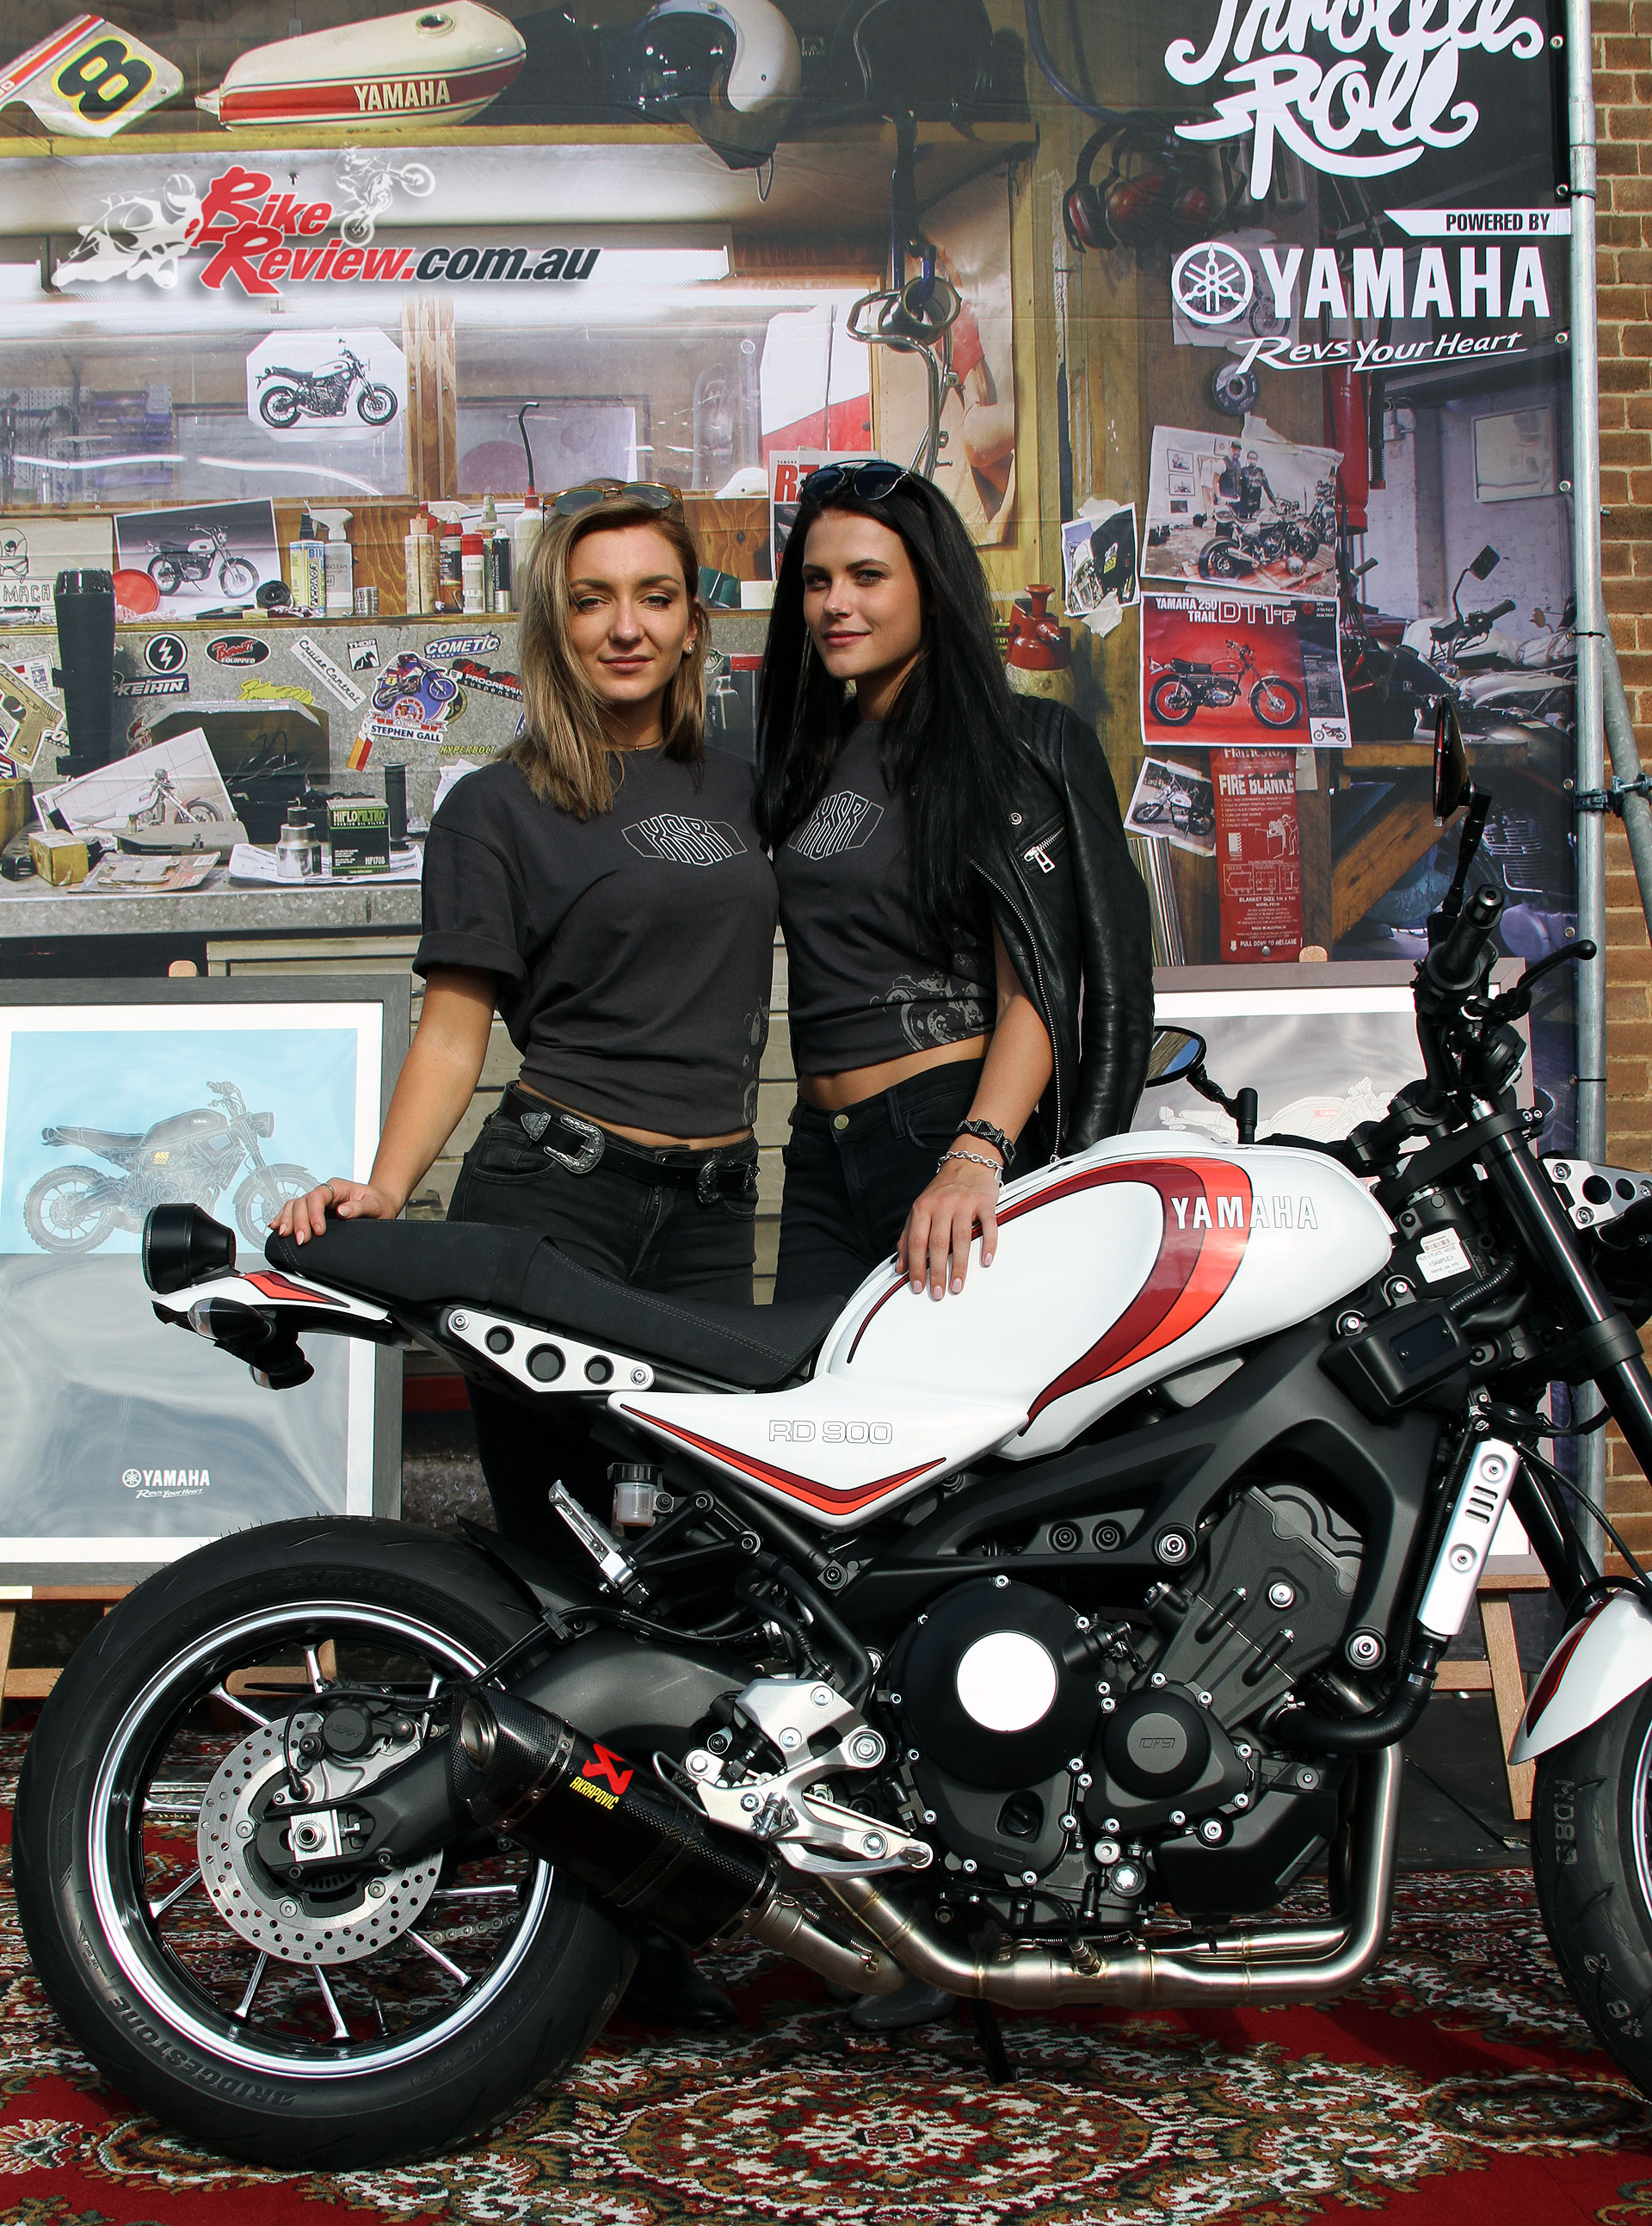 2017 Throttle Roll - Yamaha XSR900 'RD 900'